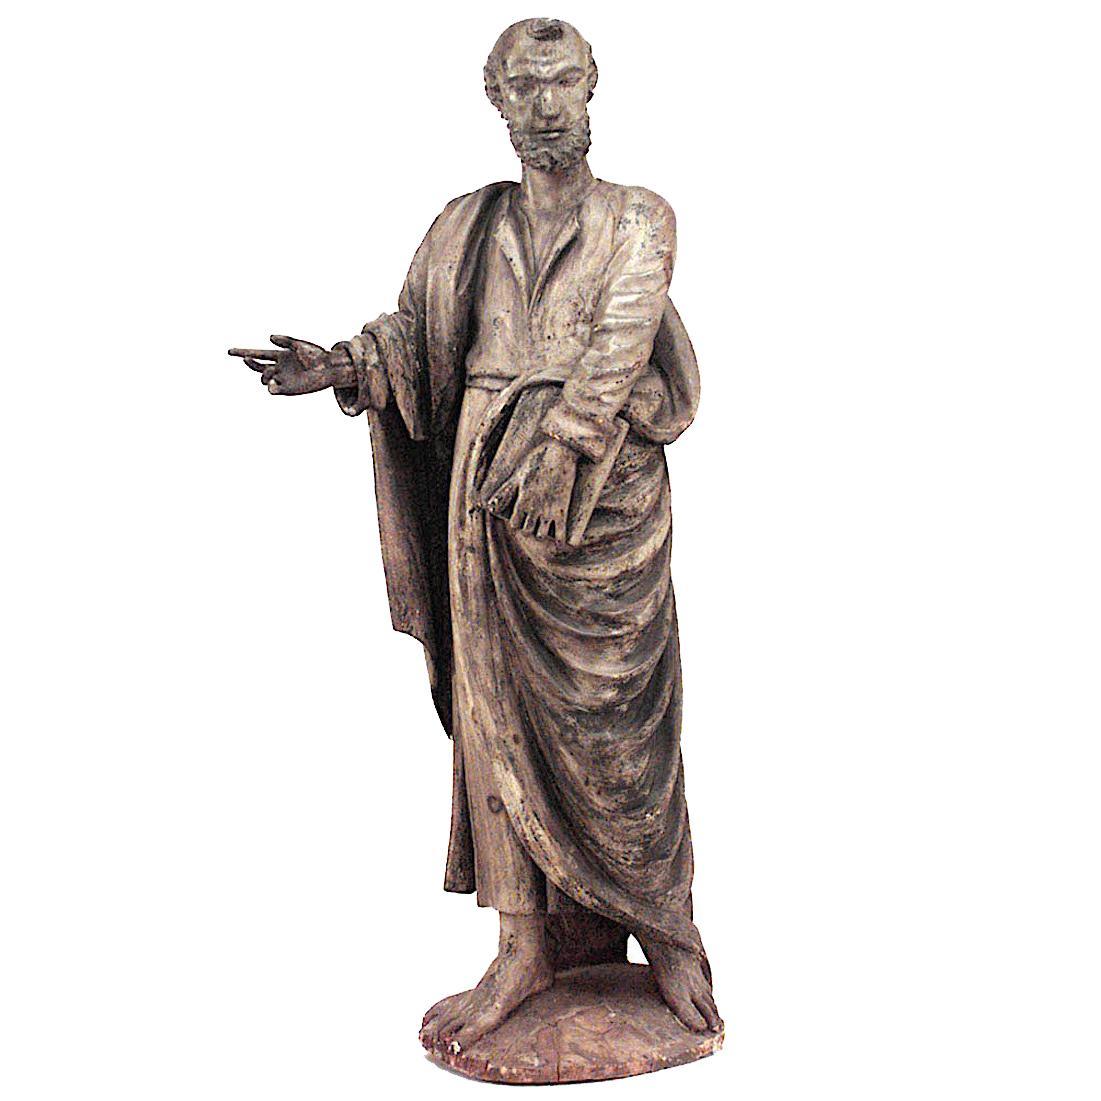 Italian Renaissance Painted Lifesize Figure of Religious Scholar